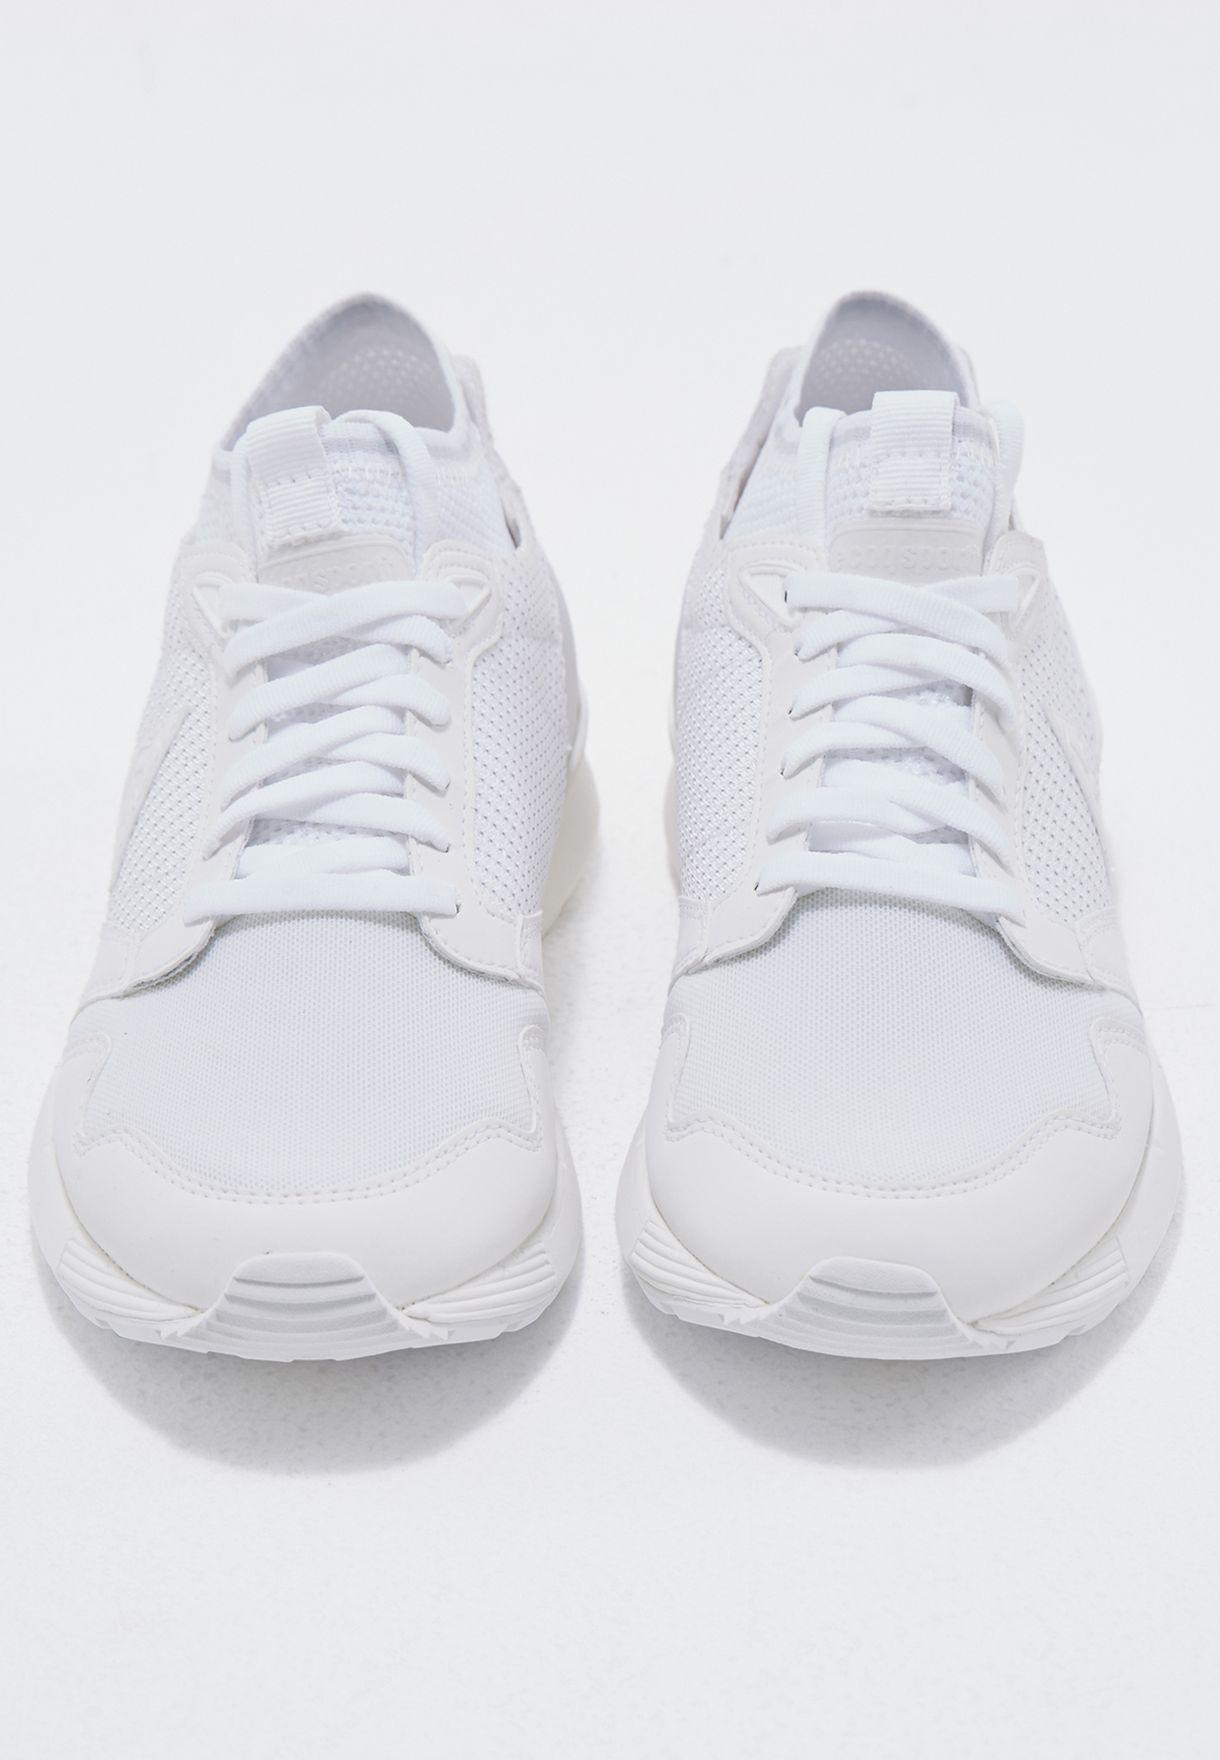 b97008eaa5f3 Shop Le Coq Sportif white Omicron Triple Reflective 1720065 for ...